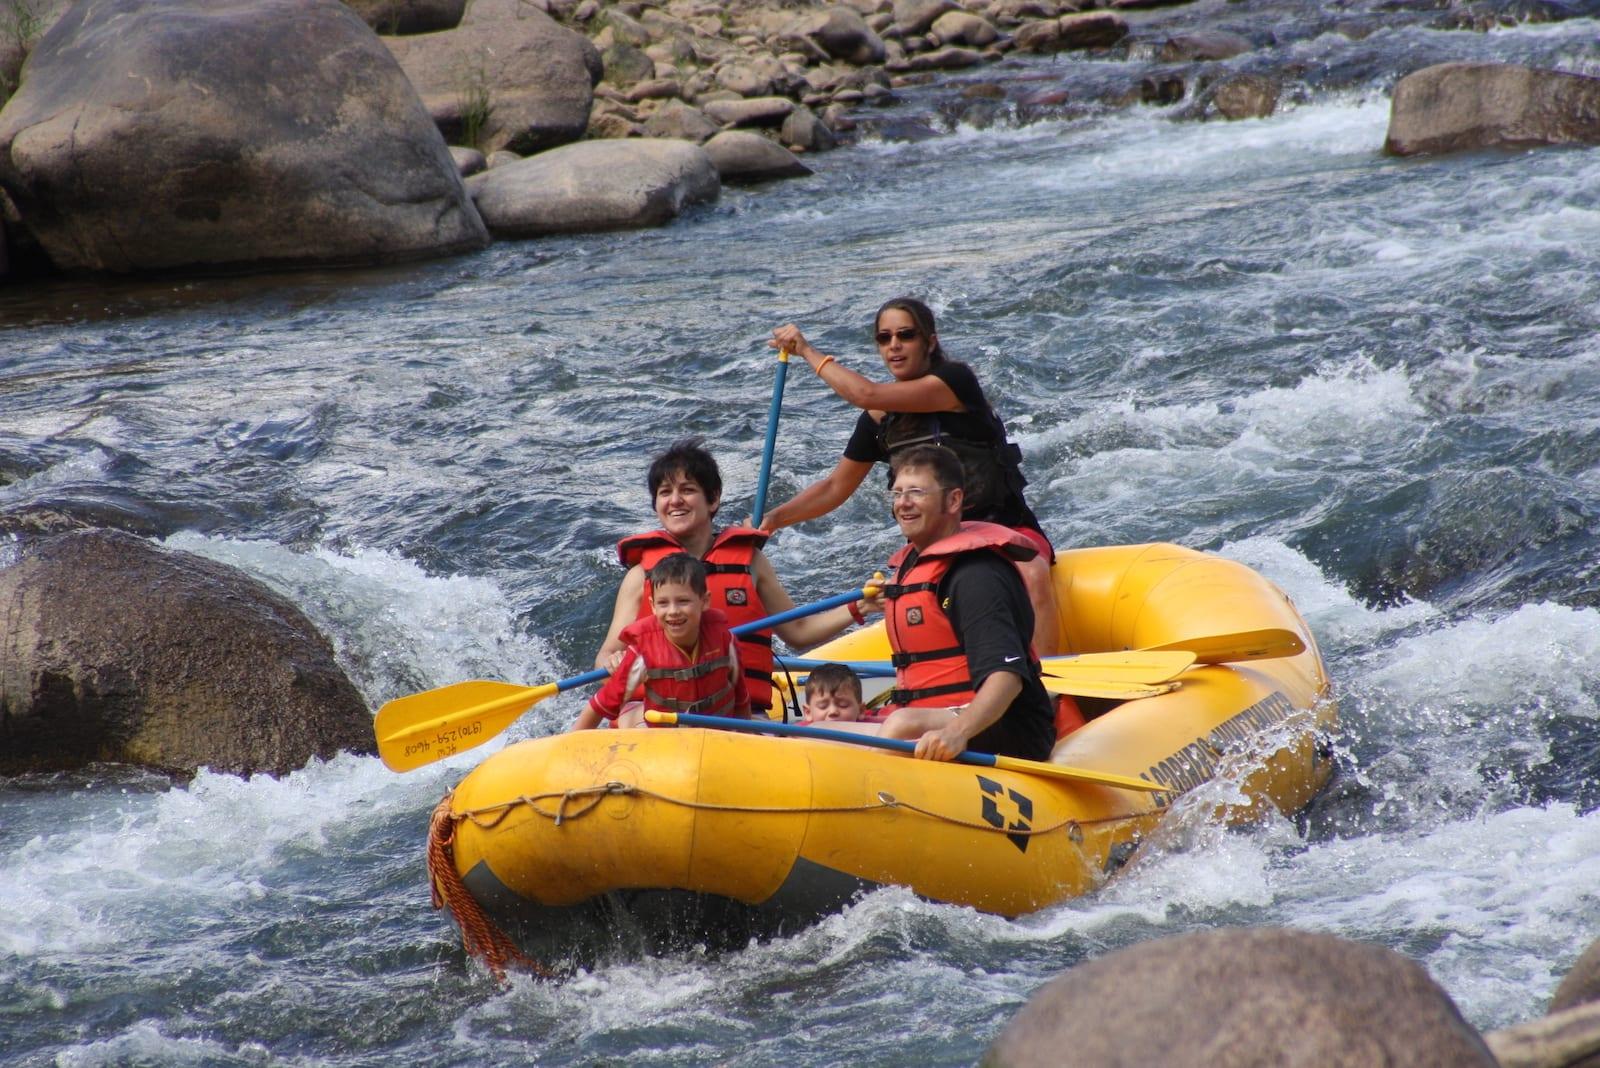 Rafting on the Lower Animas River